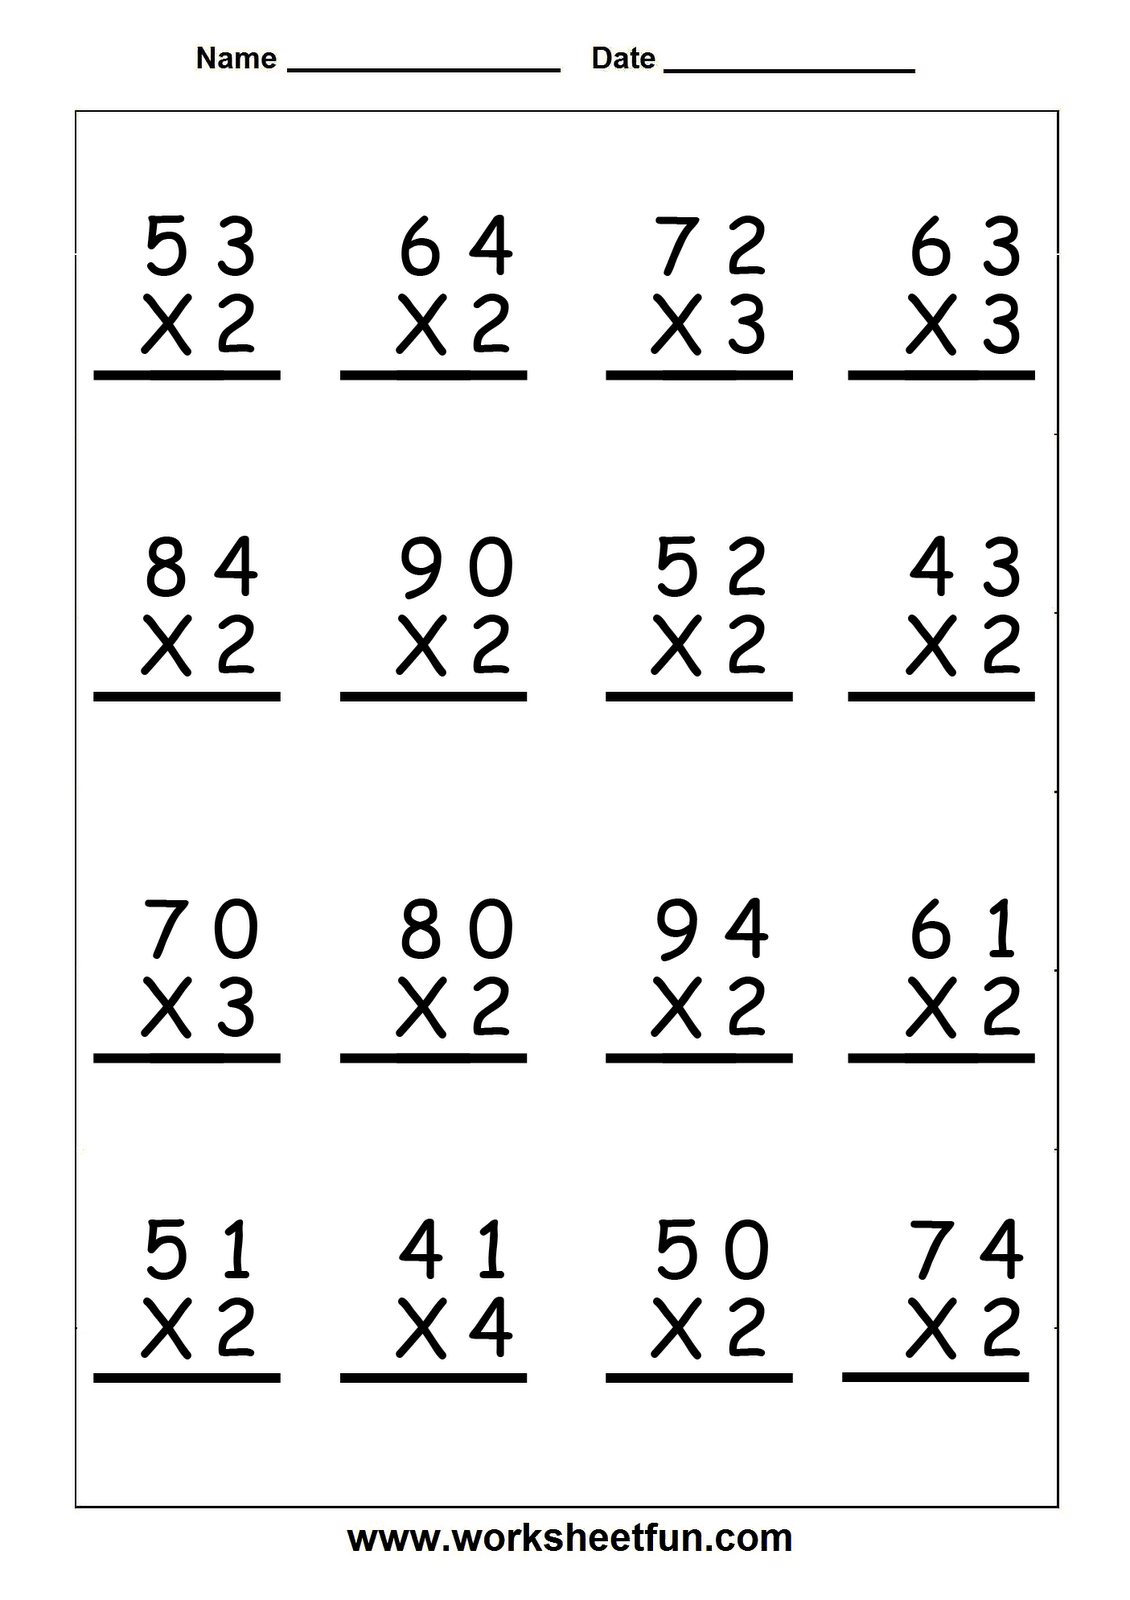 small resolution of https://dubaikhalifas.com/1st-grade-measurement-activities-5th-grade-multiplication-test-4th-grade-math-worksheets/